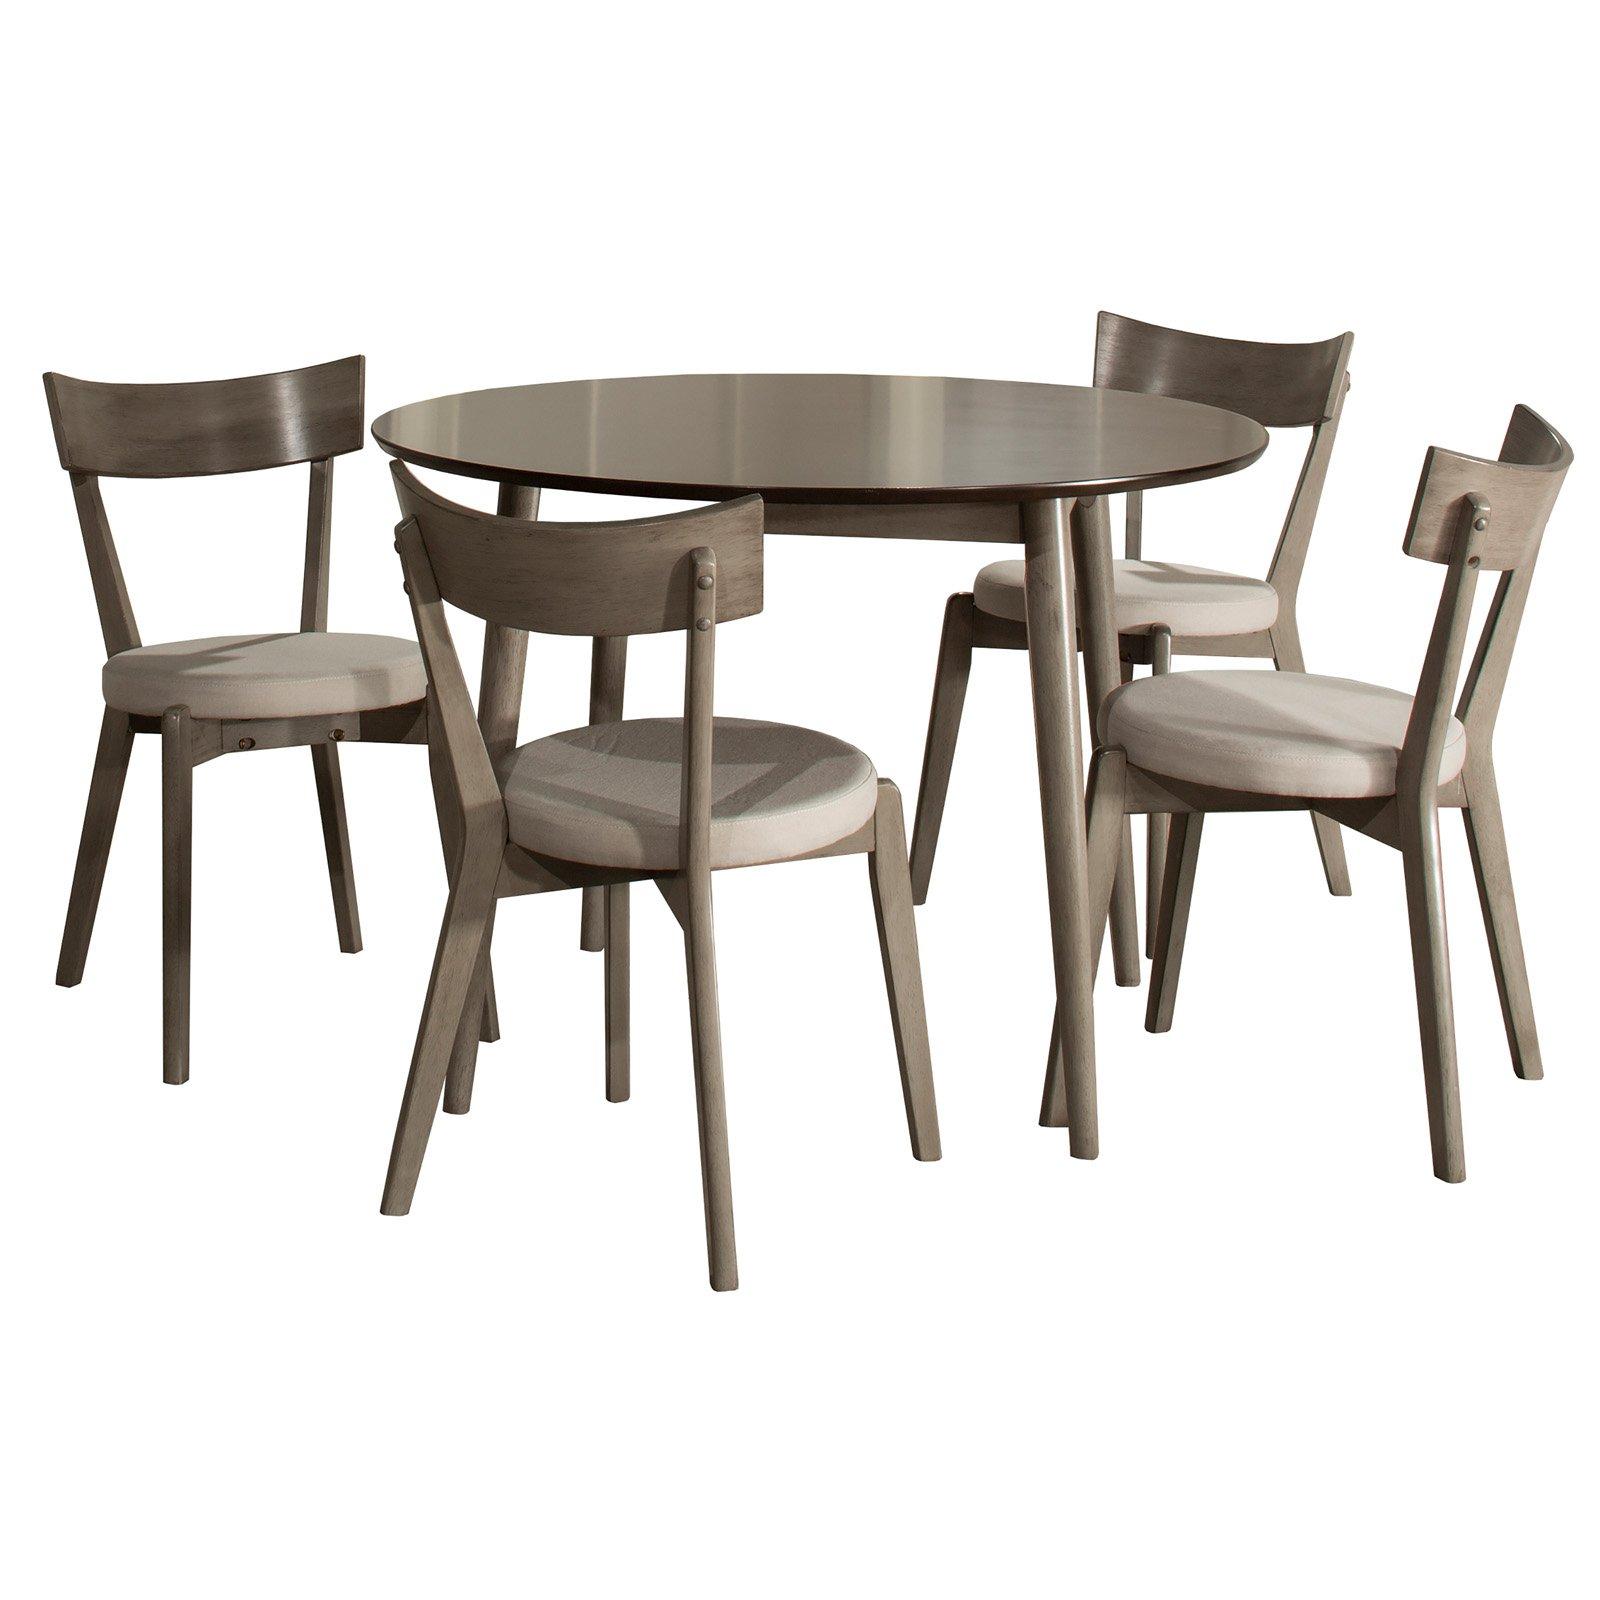 Hillsdale Furniture Mayson Five (5) Piece Dining Set